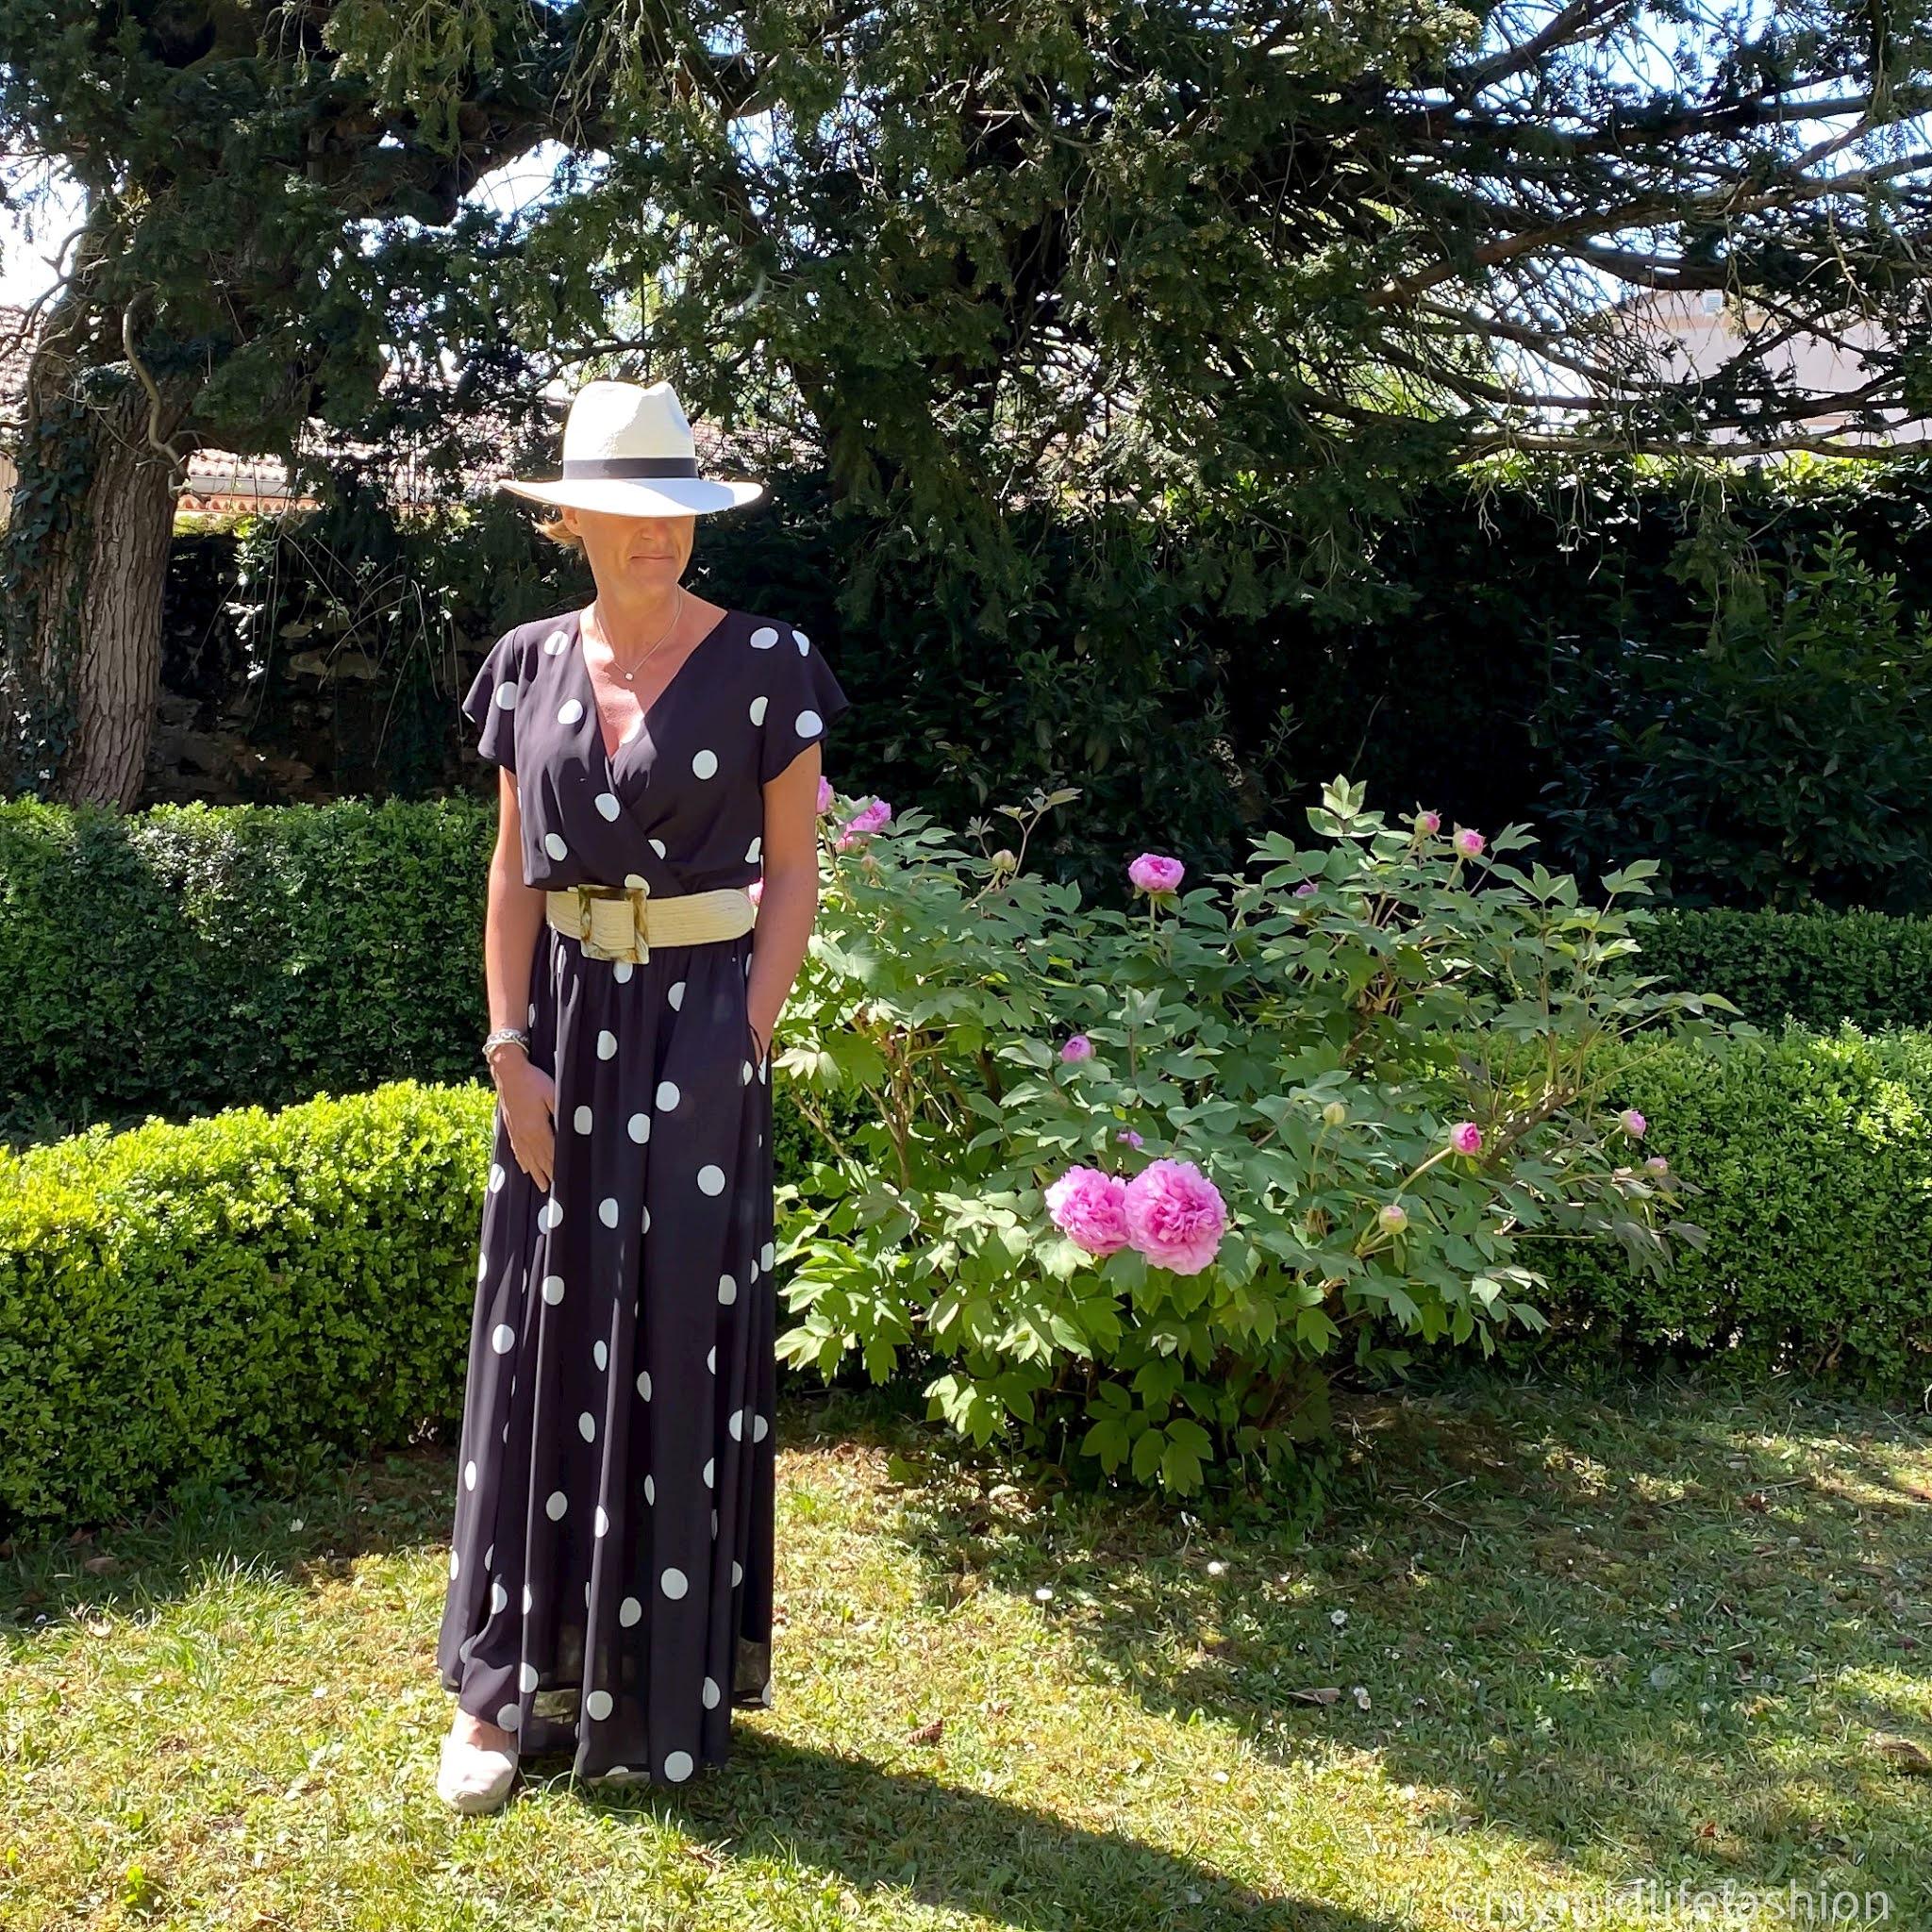 my midlife fashion, hot squash chiffon wrap top maxi dress, zara straw Panama hat, zara jute woven belt, Carl Scarpa Brittany wedge sandals